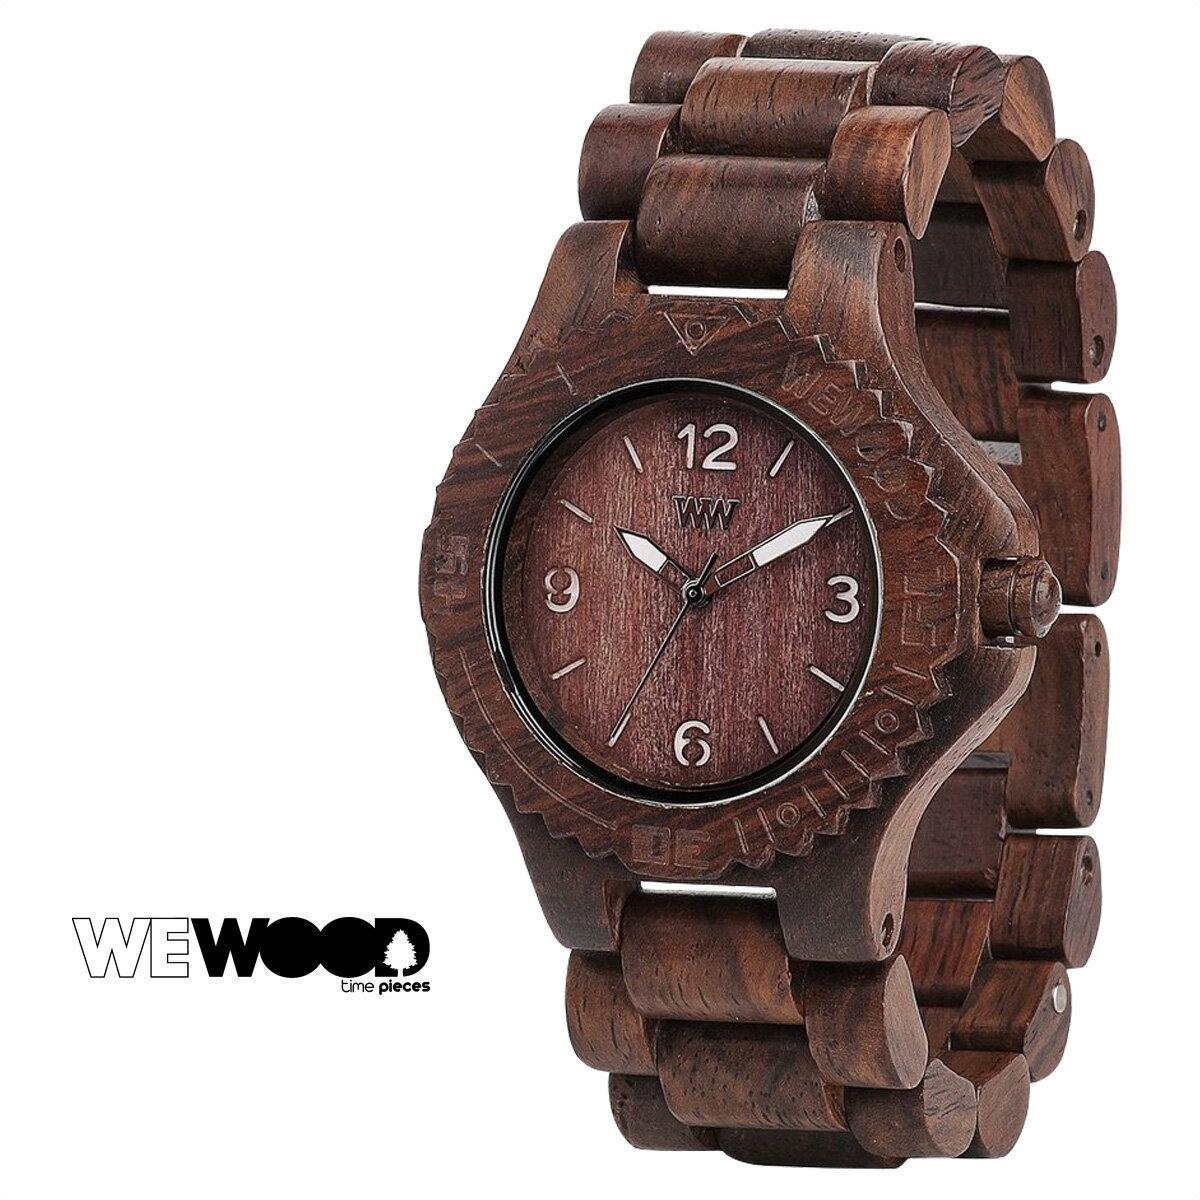 WEWOOD KALE 腕時計 メンズ レディース ウィーウッド チョコ ホワイト CHOCOLATE WHITE ケール [1712]